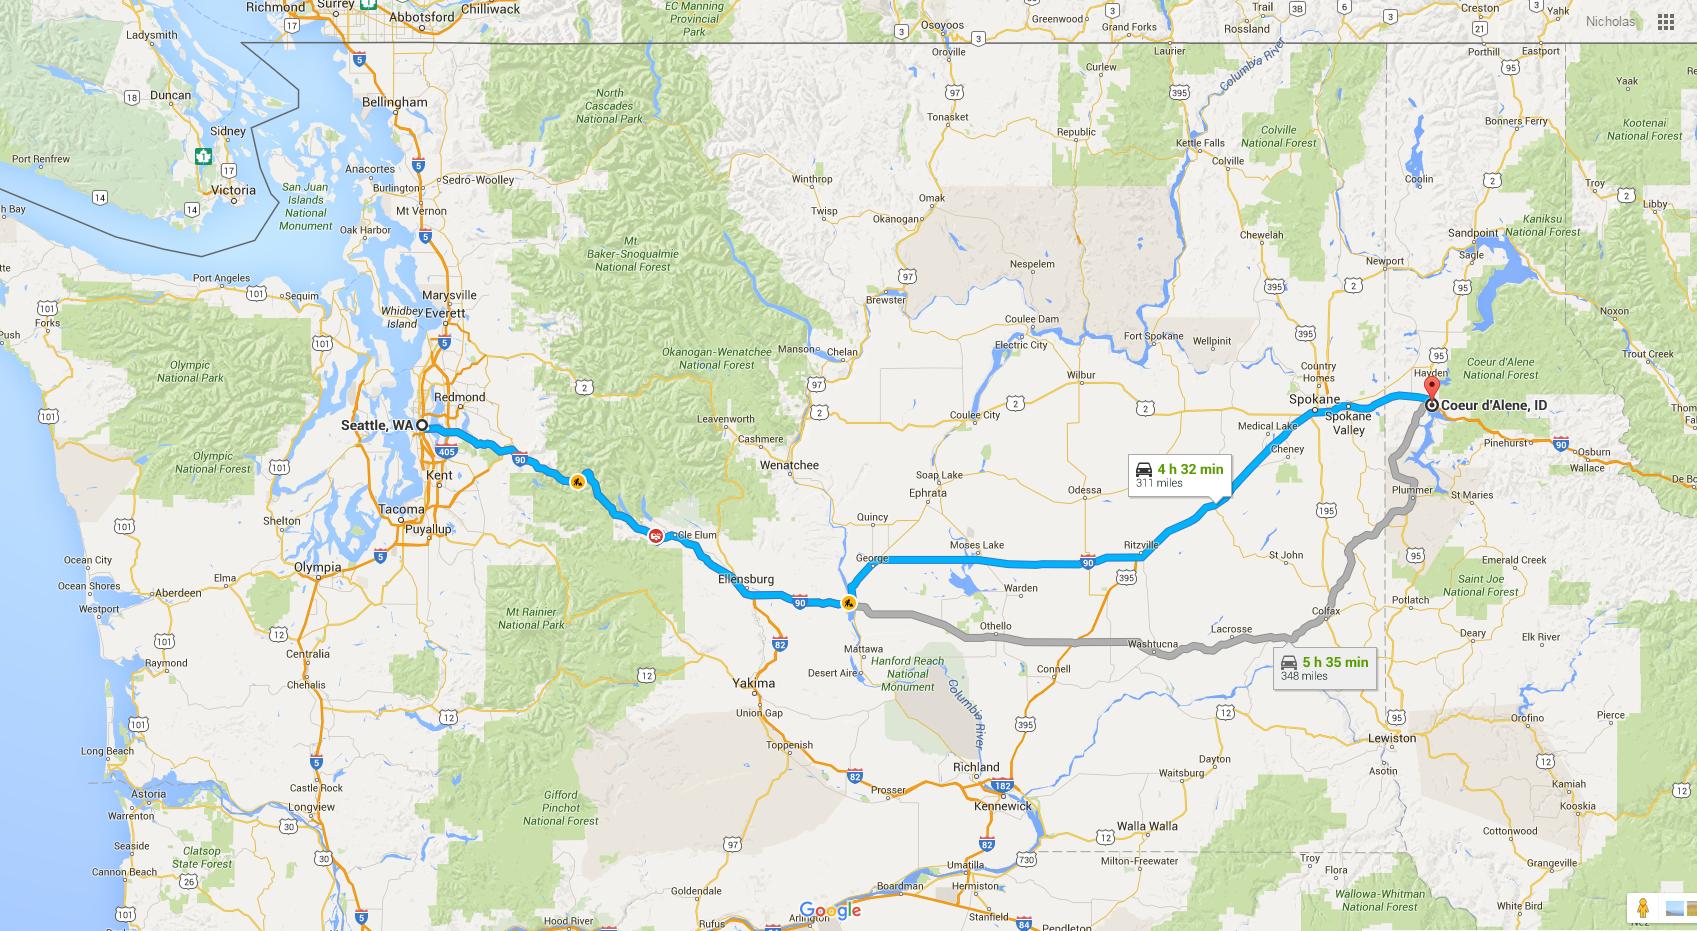 https://www.google.com/maps/dir/Seattle,+WA/Coeur+d'Alene,+ID/@47.2242396,-120.677991,8z/data=!3m1!4b1!4m14!4m13!1m5!1m1!1s0x5490102c93e83355:0x102565466944d59a!2m2!1d-122.3320708!2d47.6062095!1m5!1m1!1s0x5361b4f8ba557c8f:0x5fe5995b05bf5290!2m2!1d-116.7804664!2d47.6776832!3e0